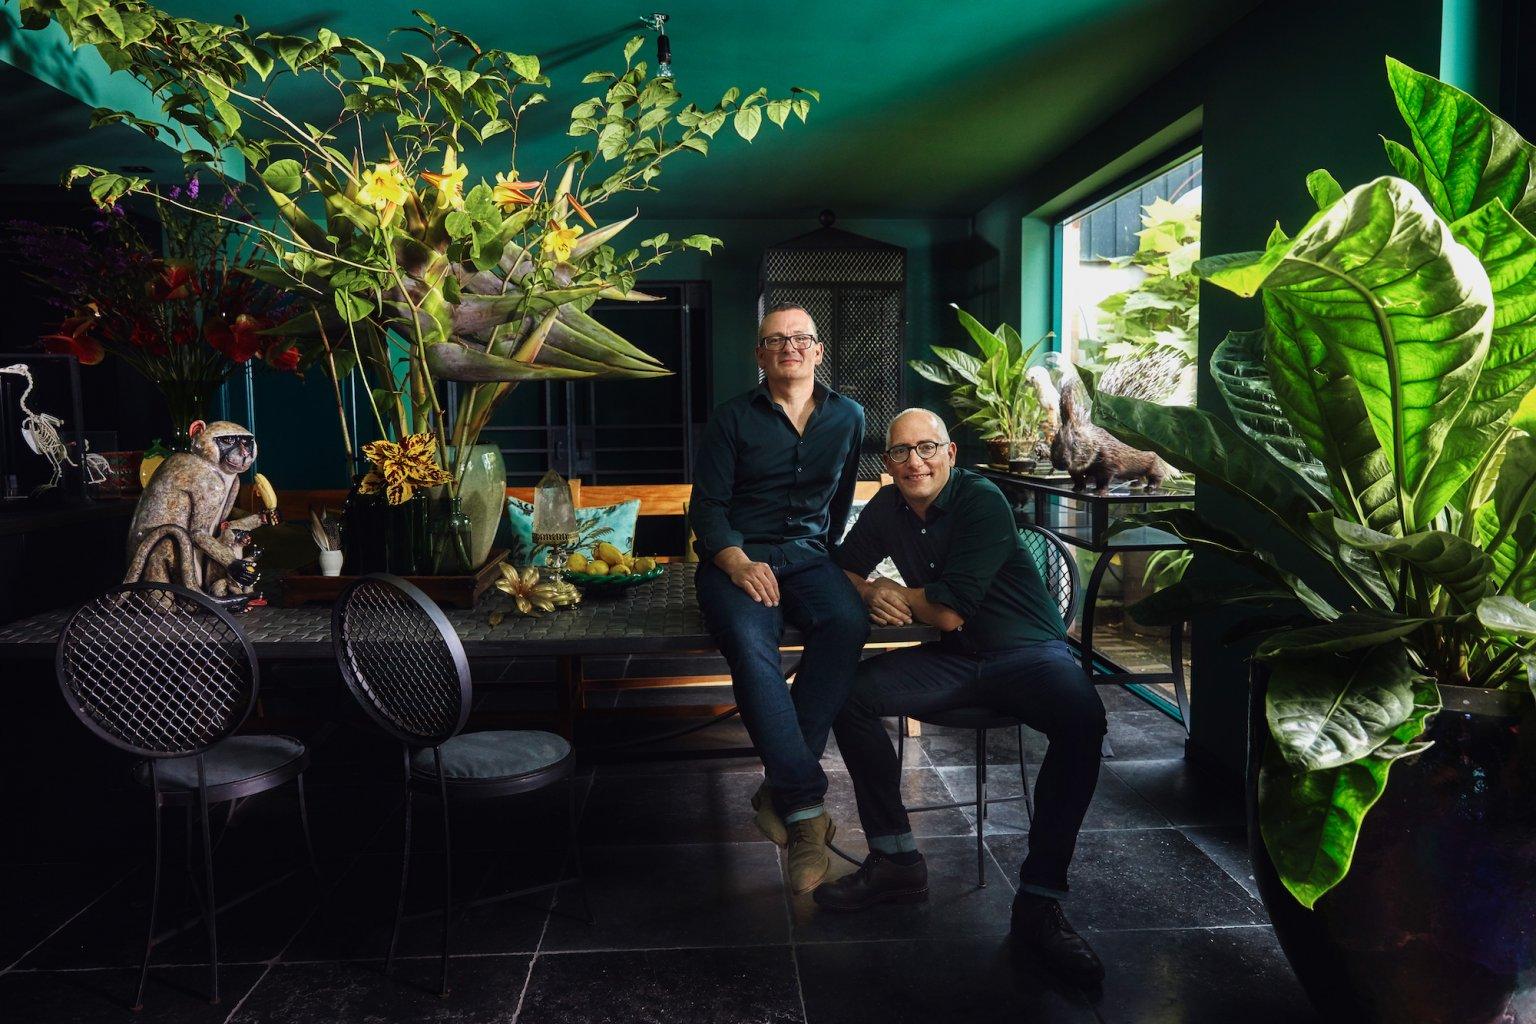 l'Europe opent 't Huys met Mendo, The Wunderkammer en trattoria Graziella